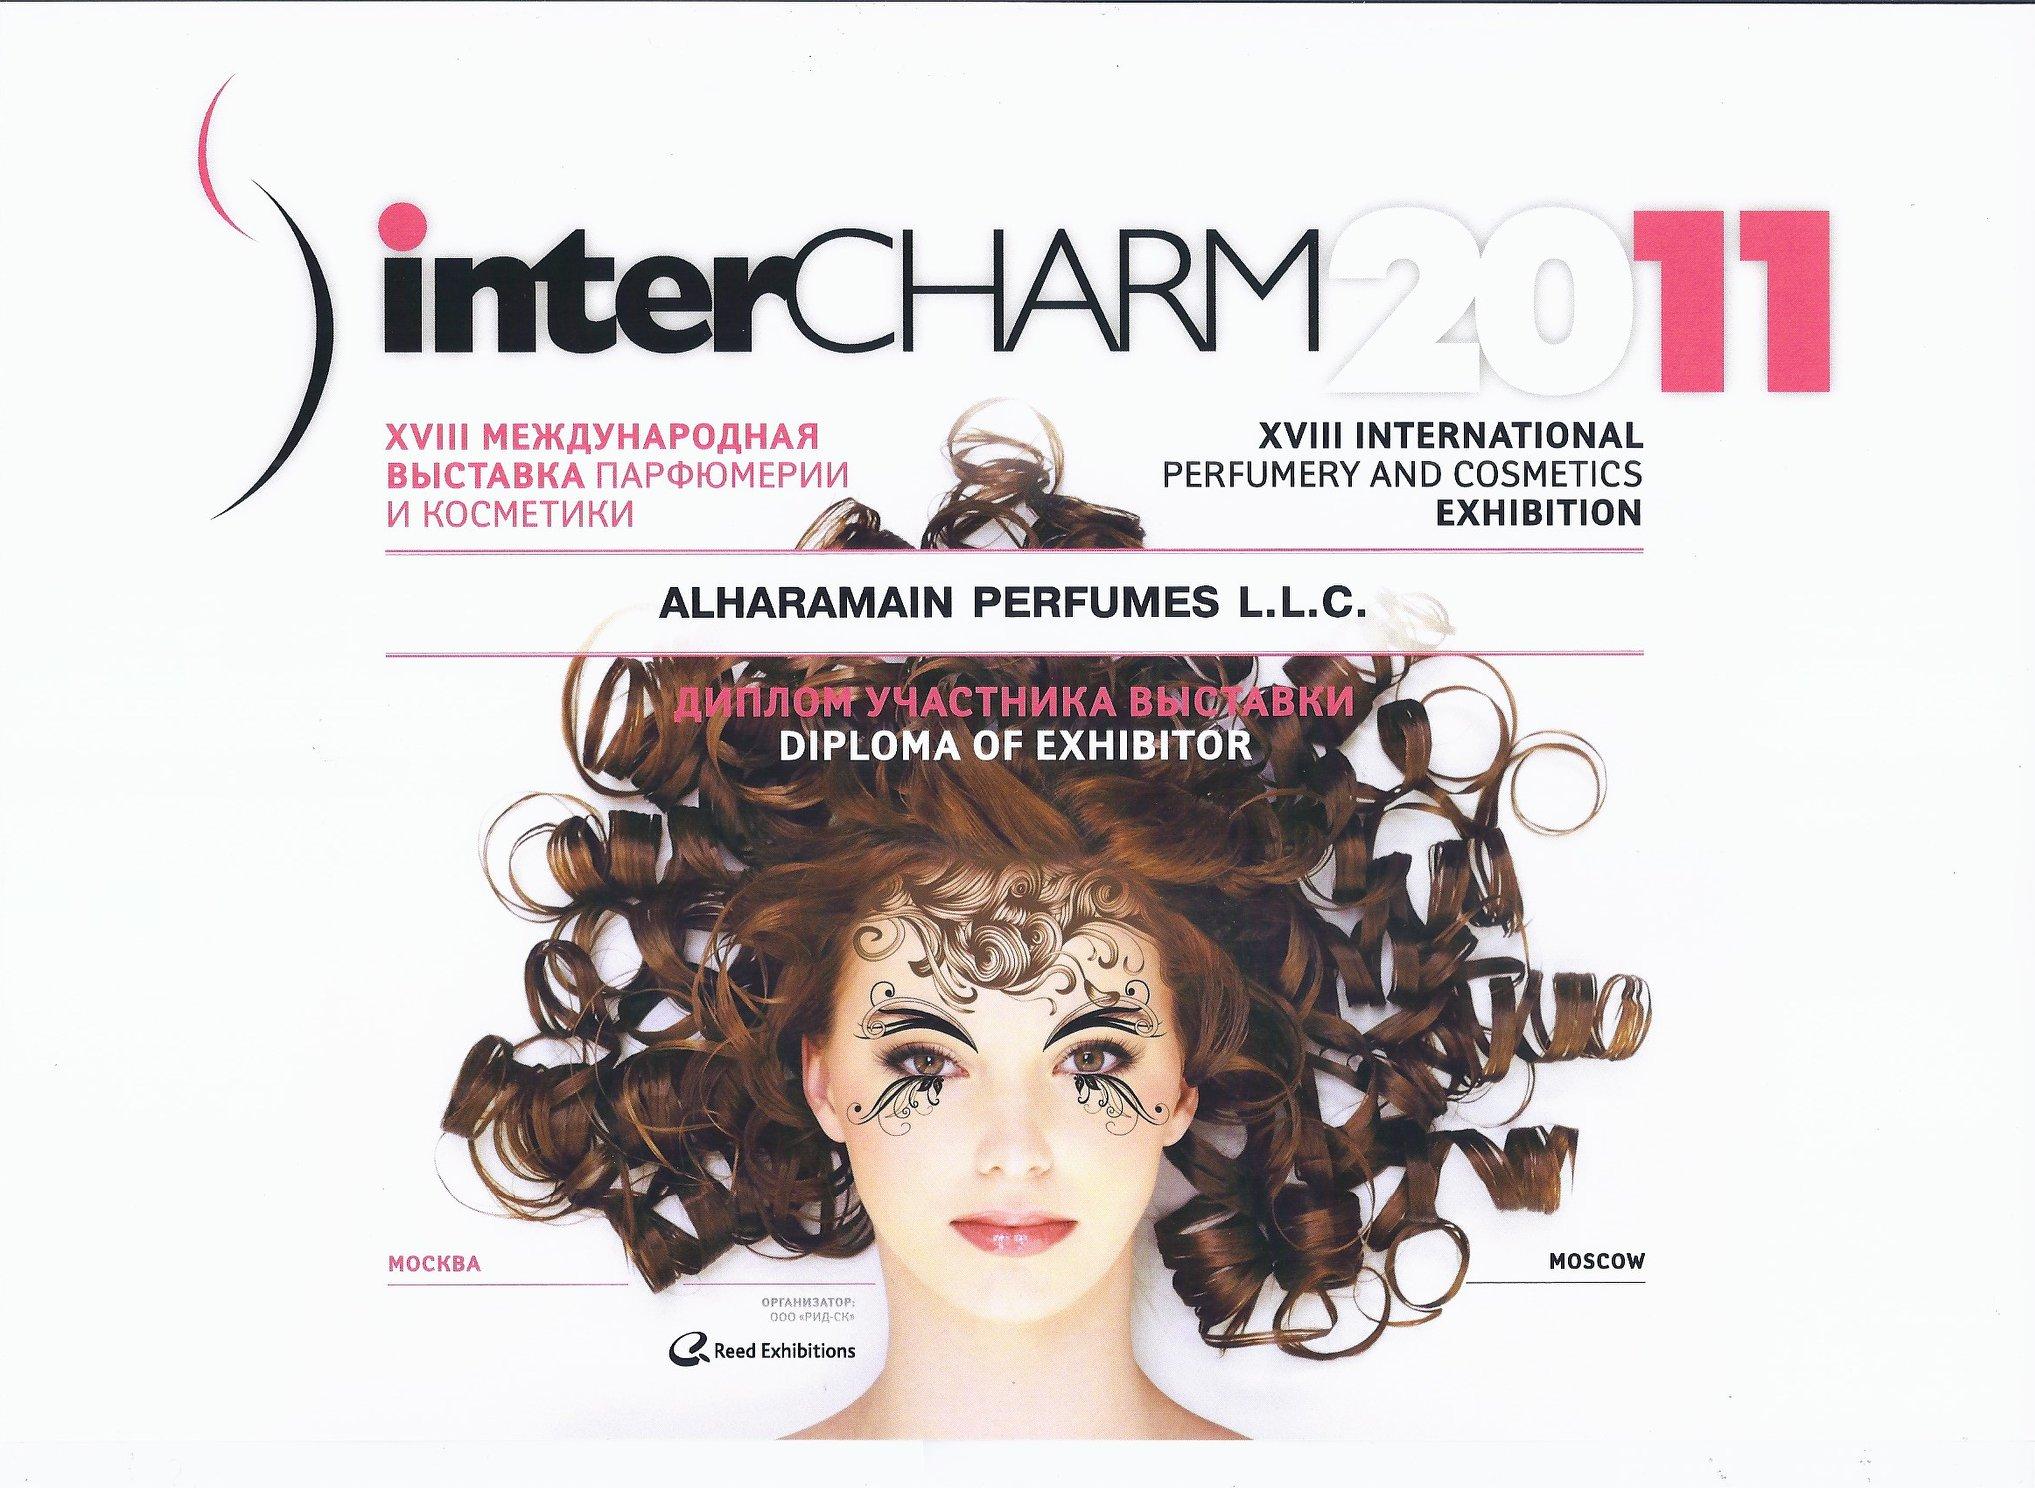 al haramain perfumes exhibiting at the 2011 intercharm moscow russia